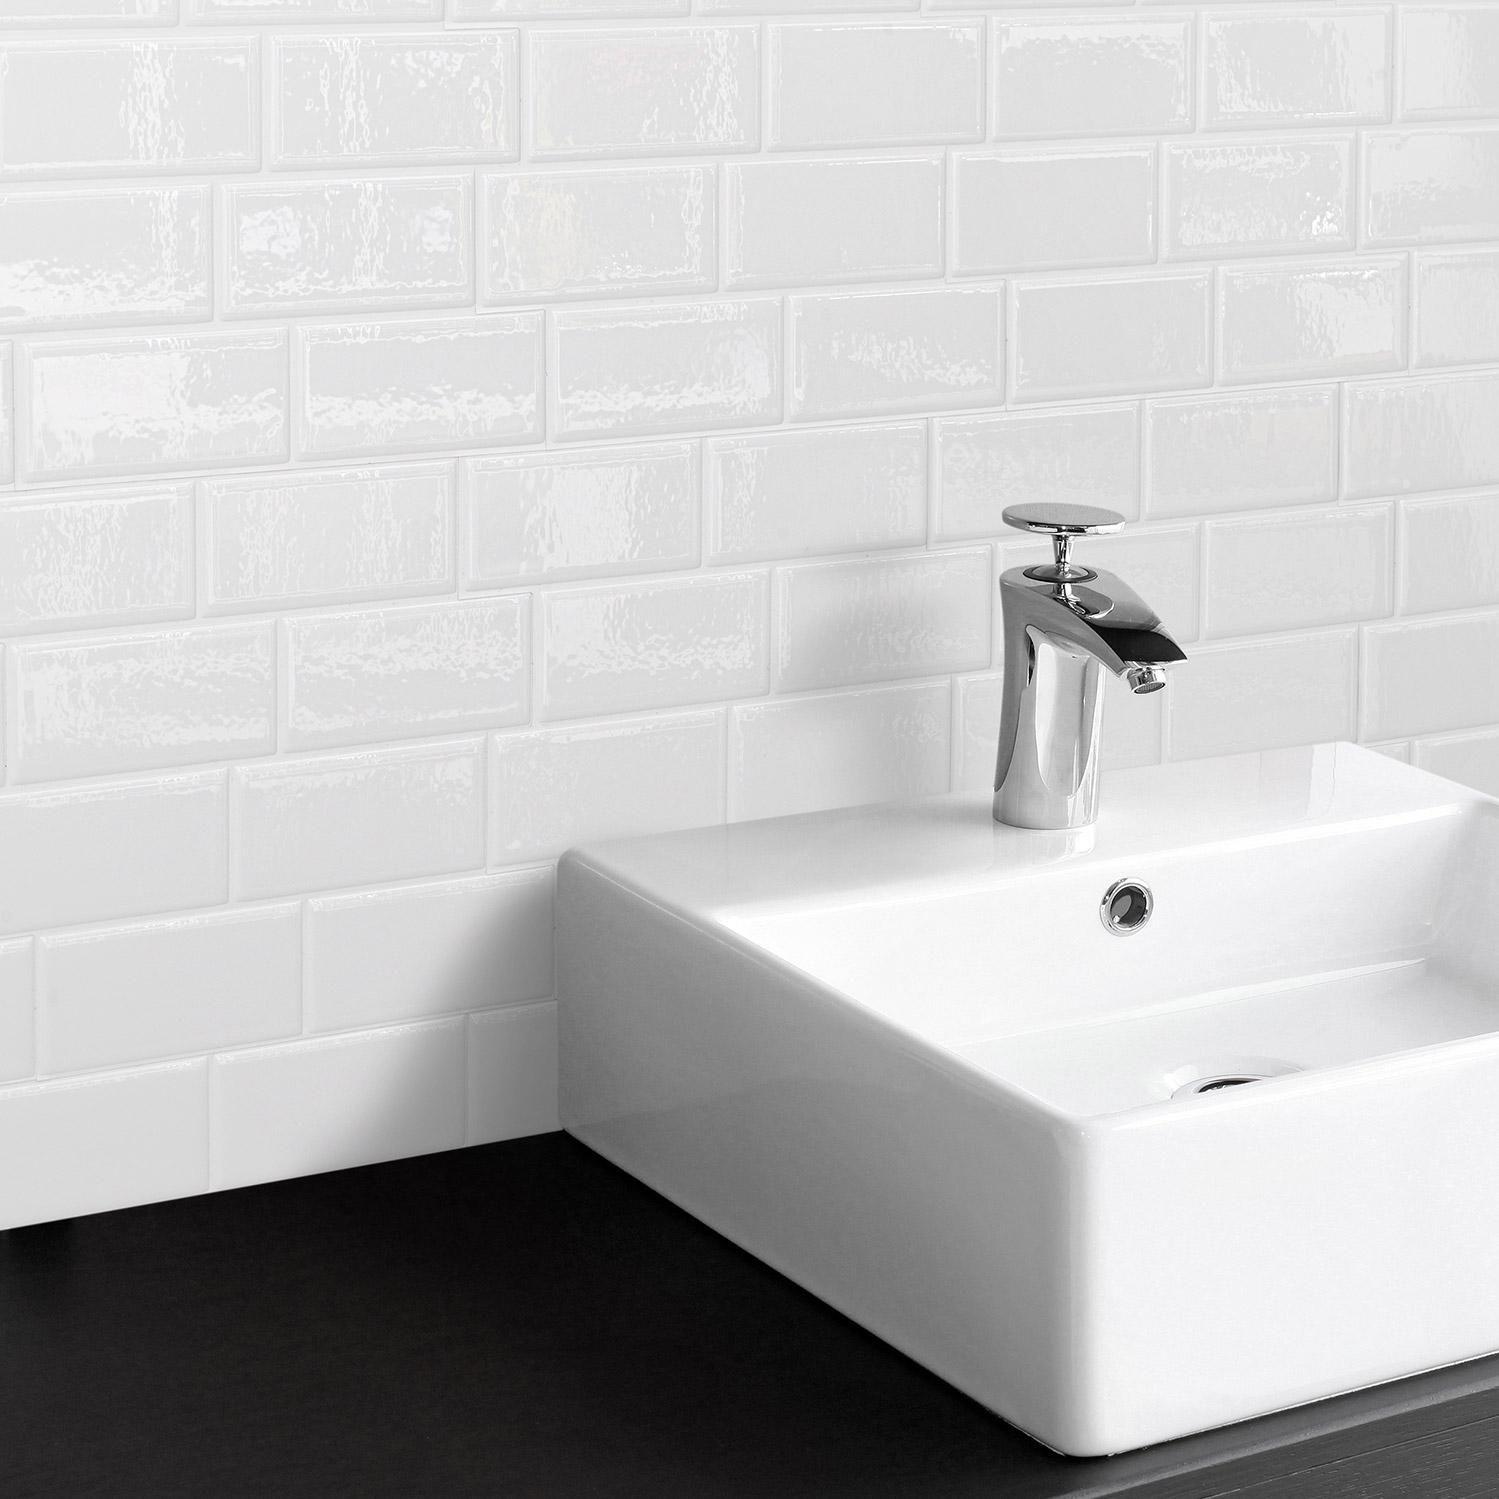 Credence Adhesive Smart Tiles Metro Blanco Blanc 29 36 X 21 29 Cm Credence Adhesive Smart Tiles Et Tuile De Dosseret